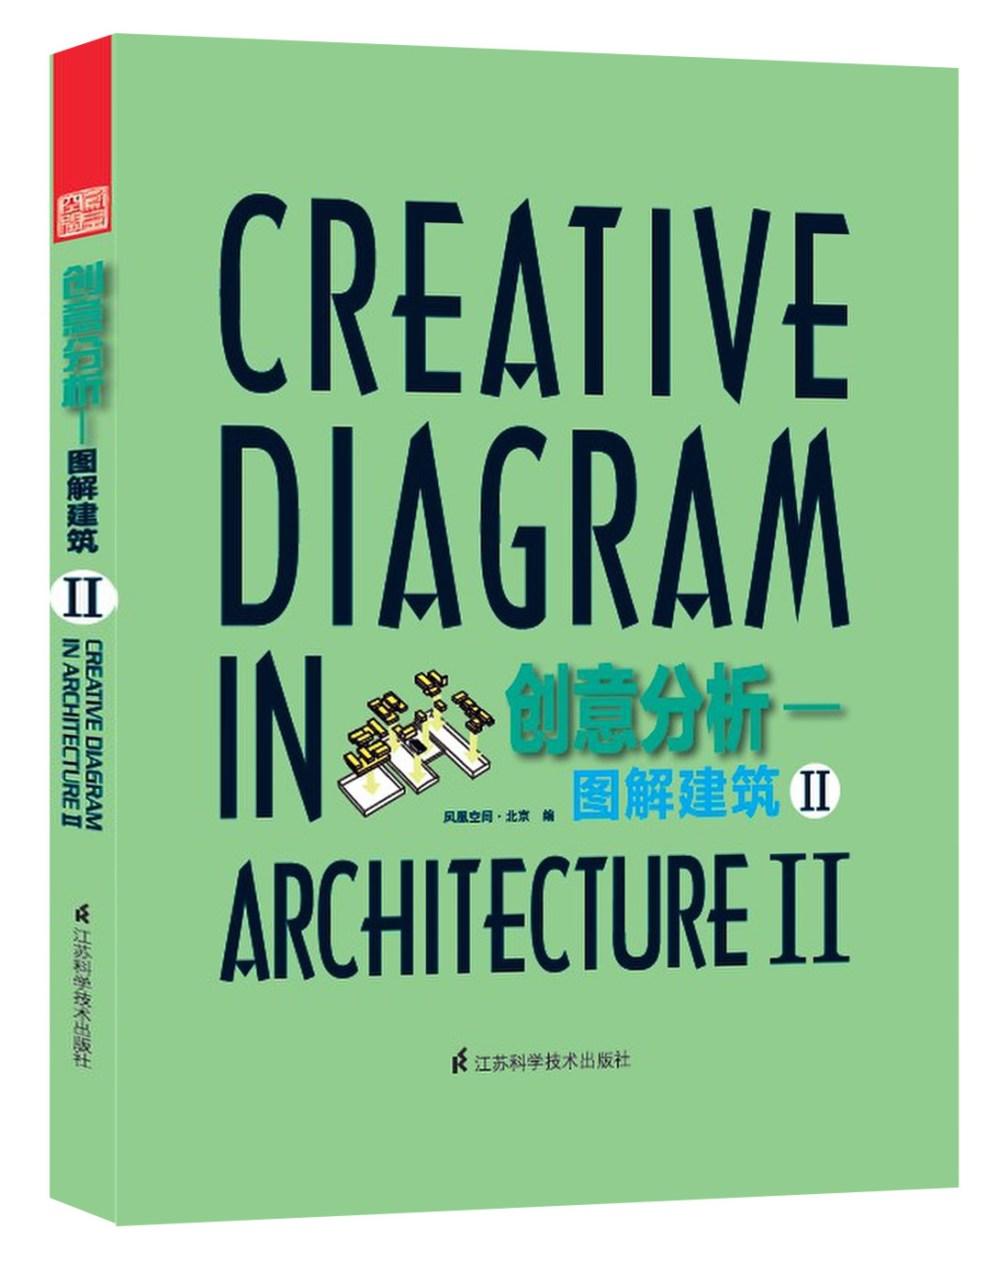 medium resolution of book name creative diagram in architecture 2